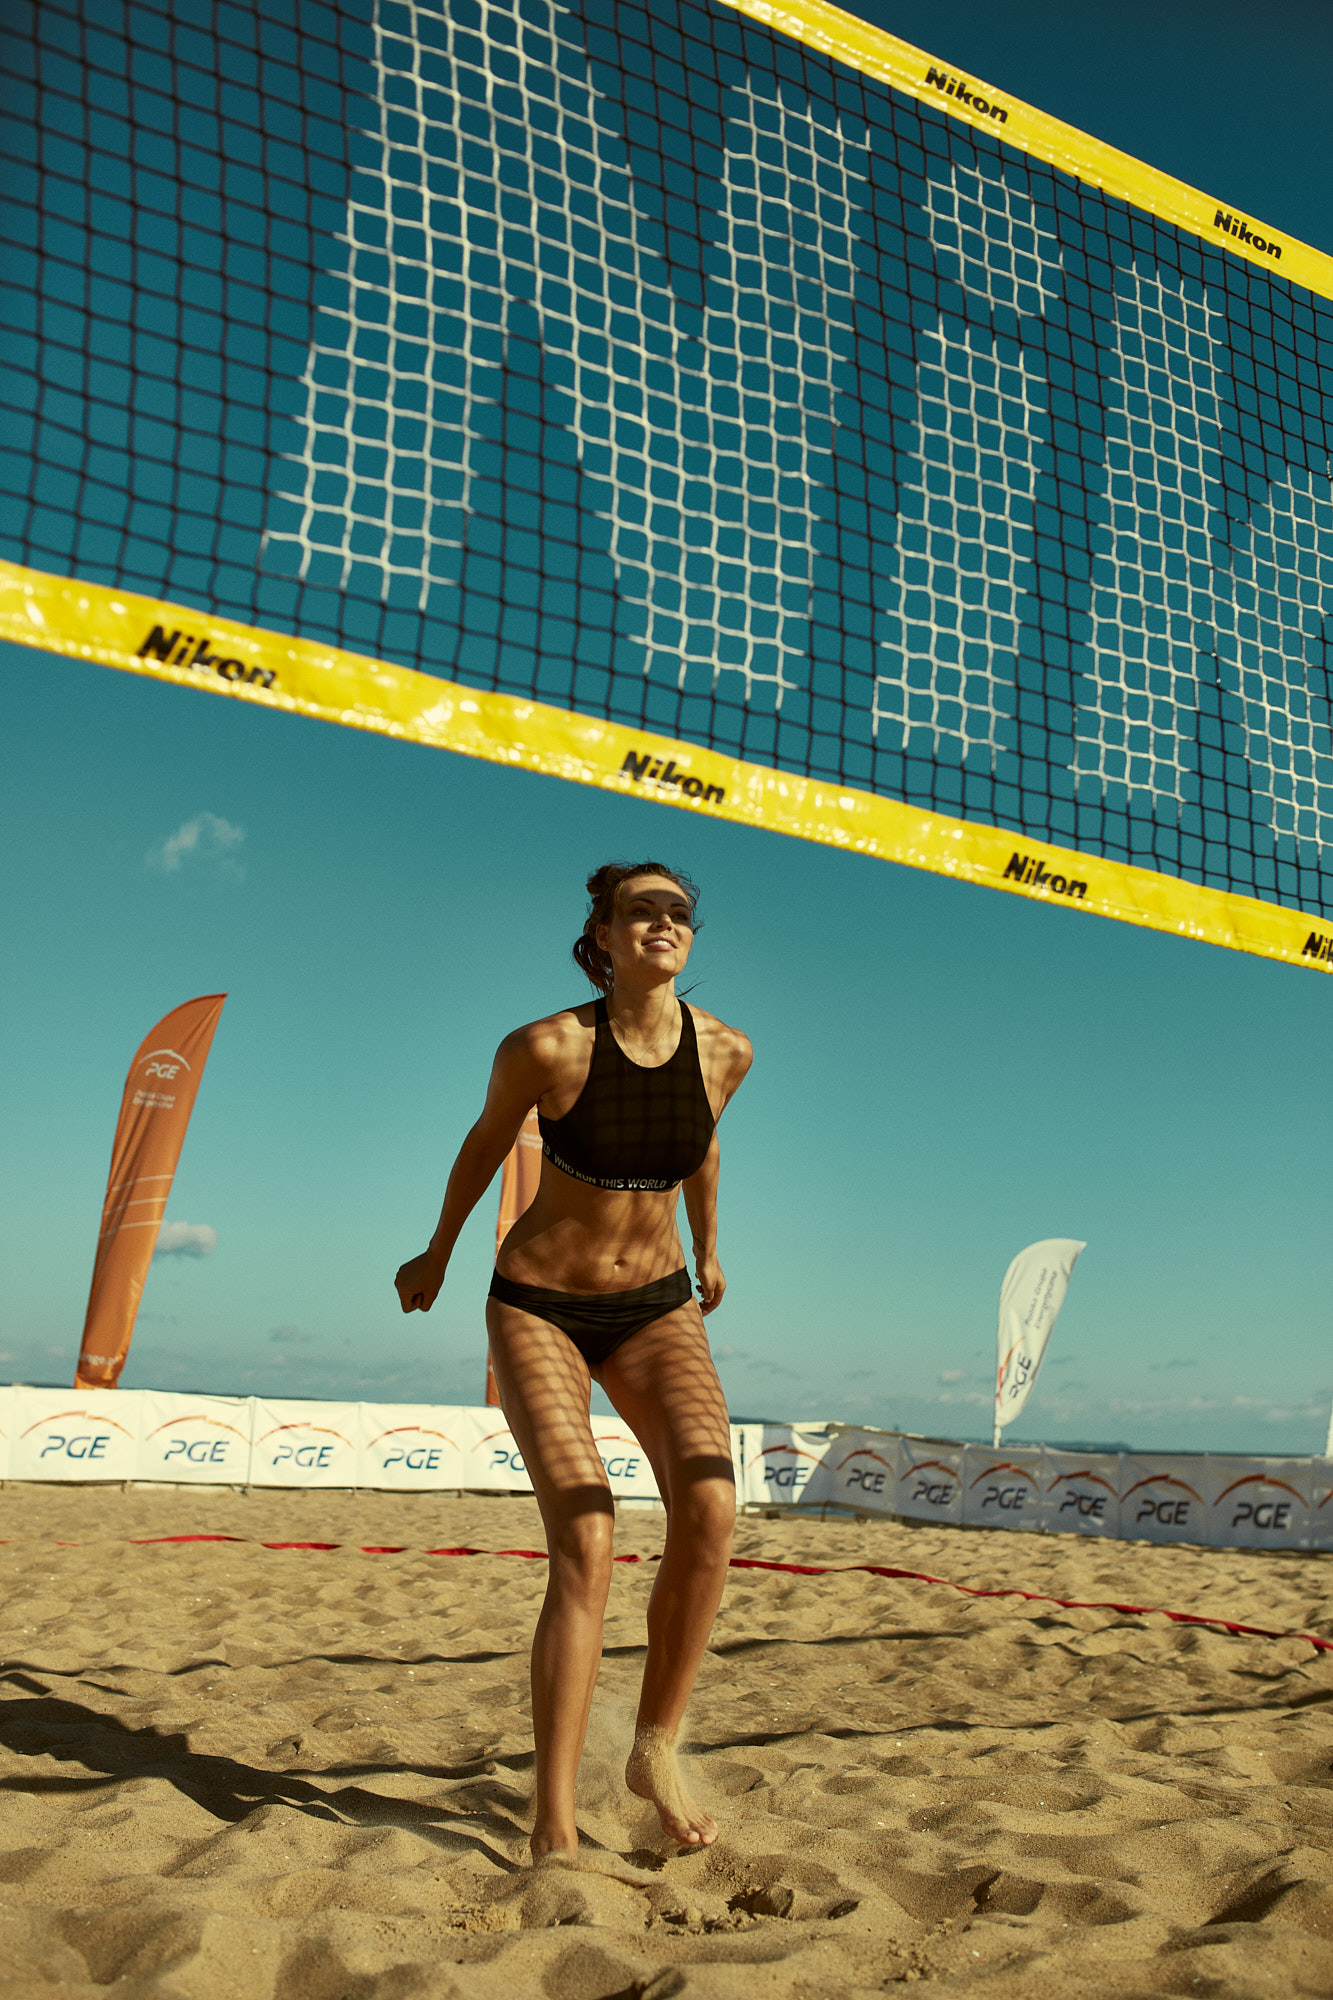 volleybal sportswoman maja tokarska x marcin biedron